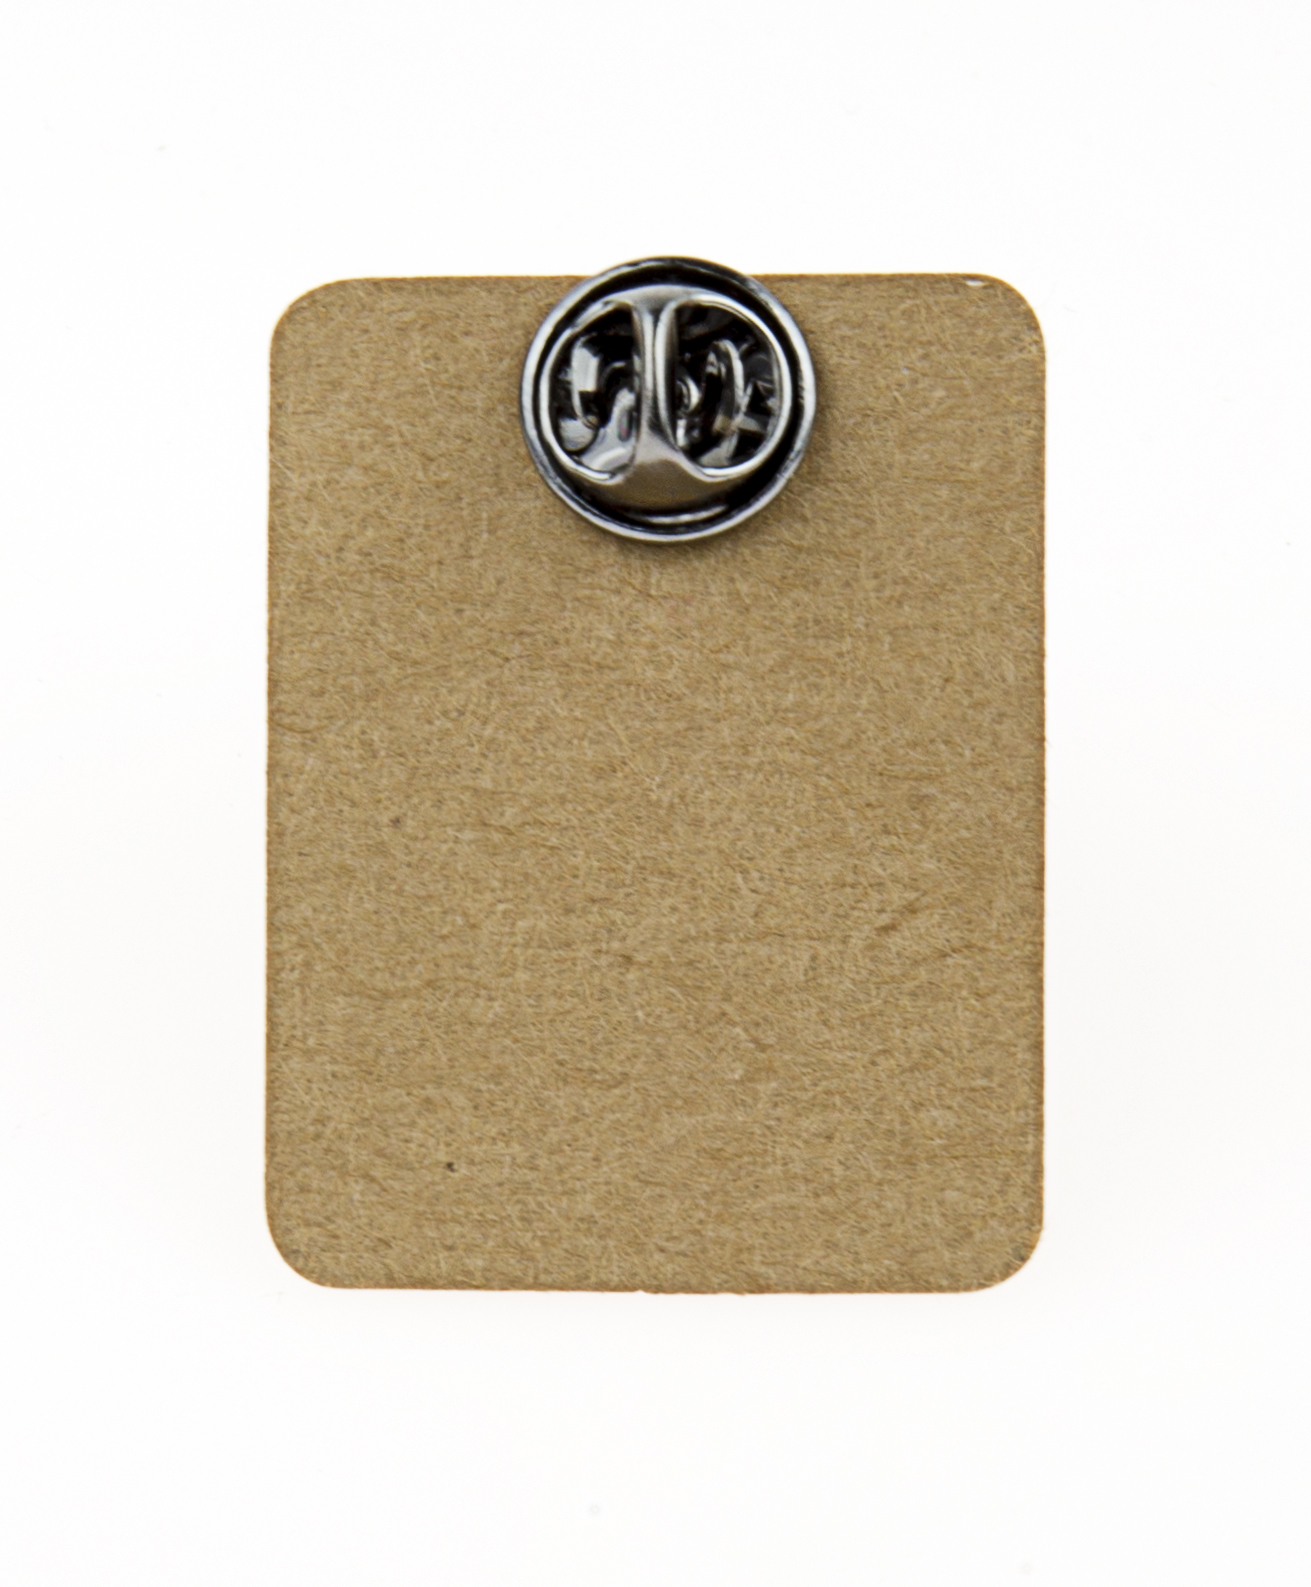 Metal Pineapple House Enamel Pin Badge